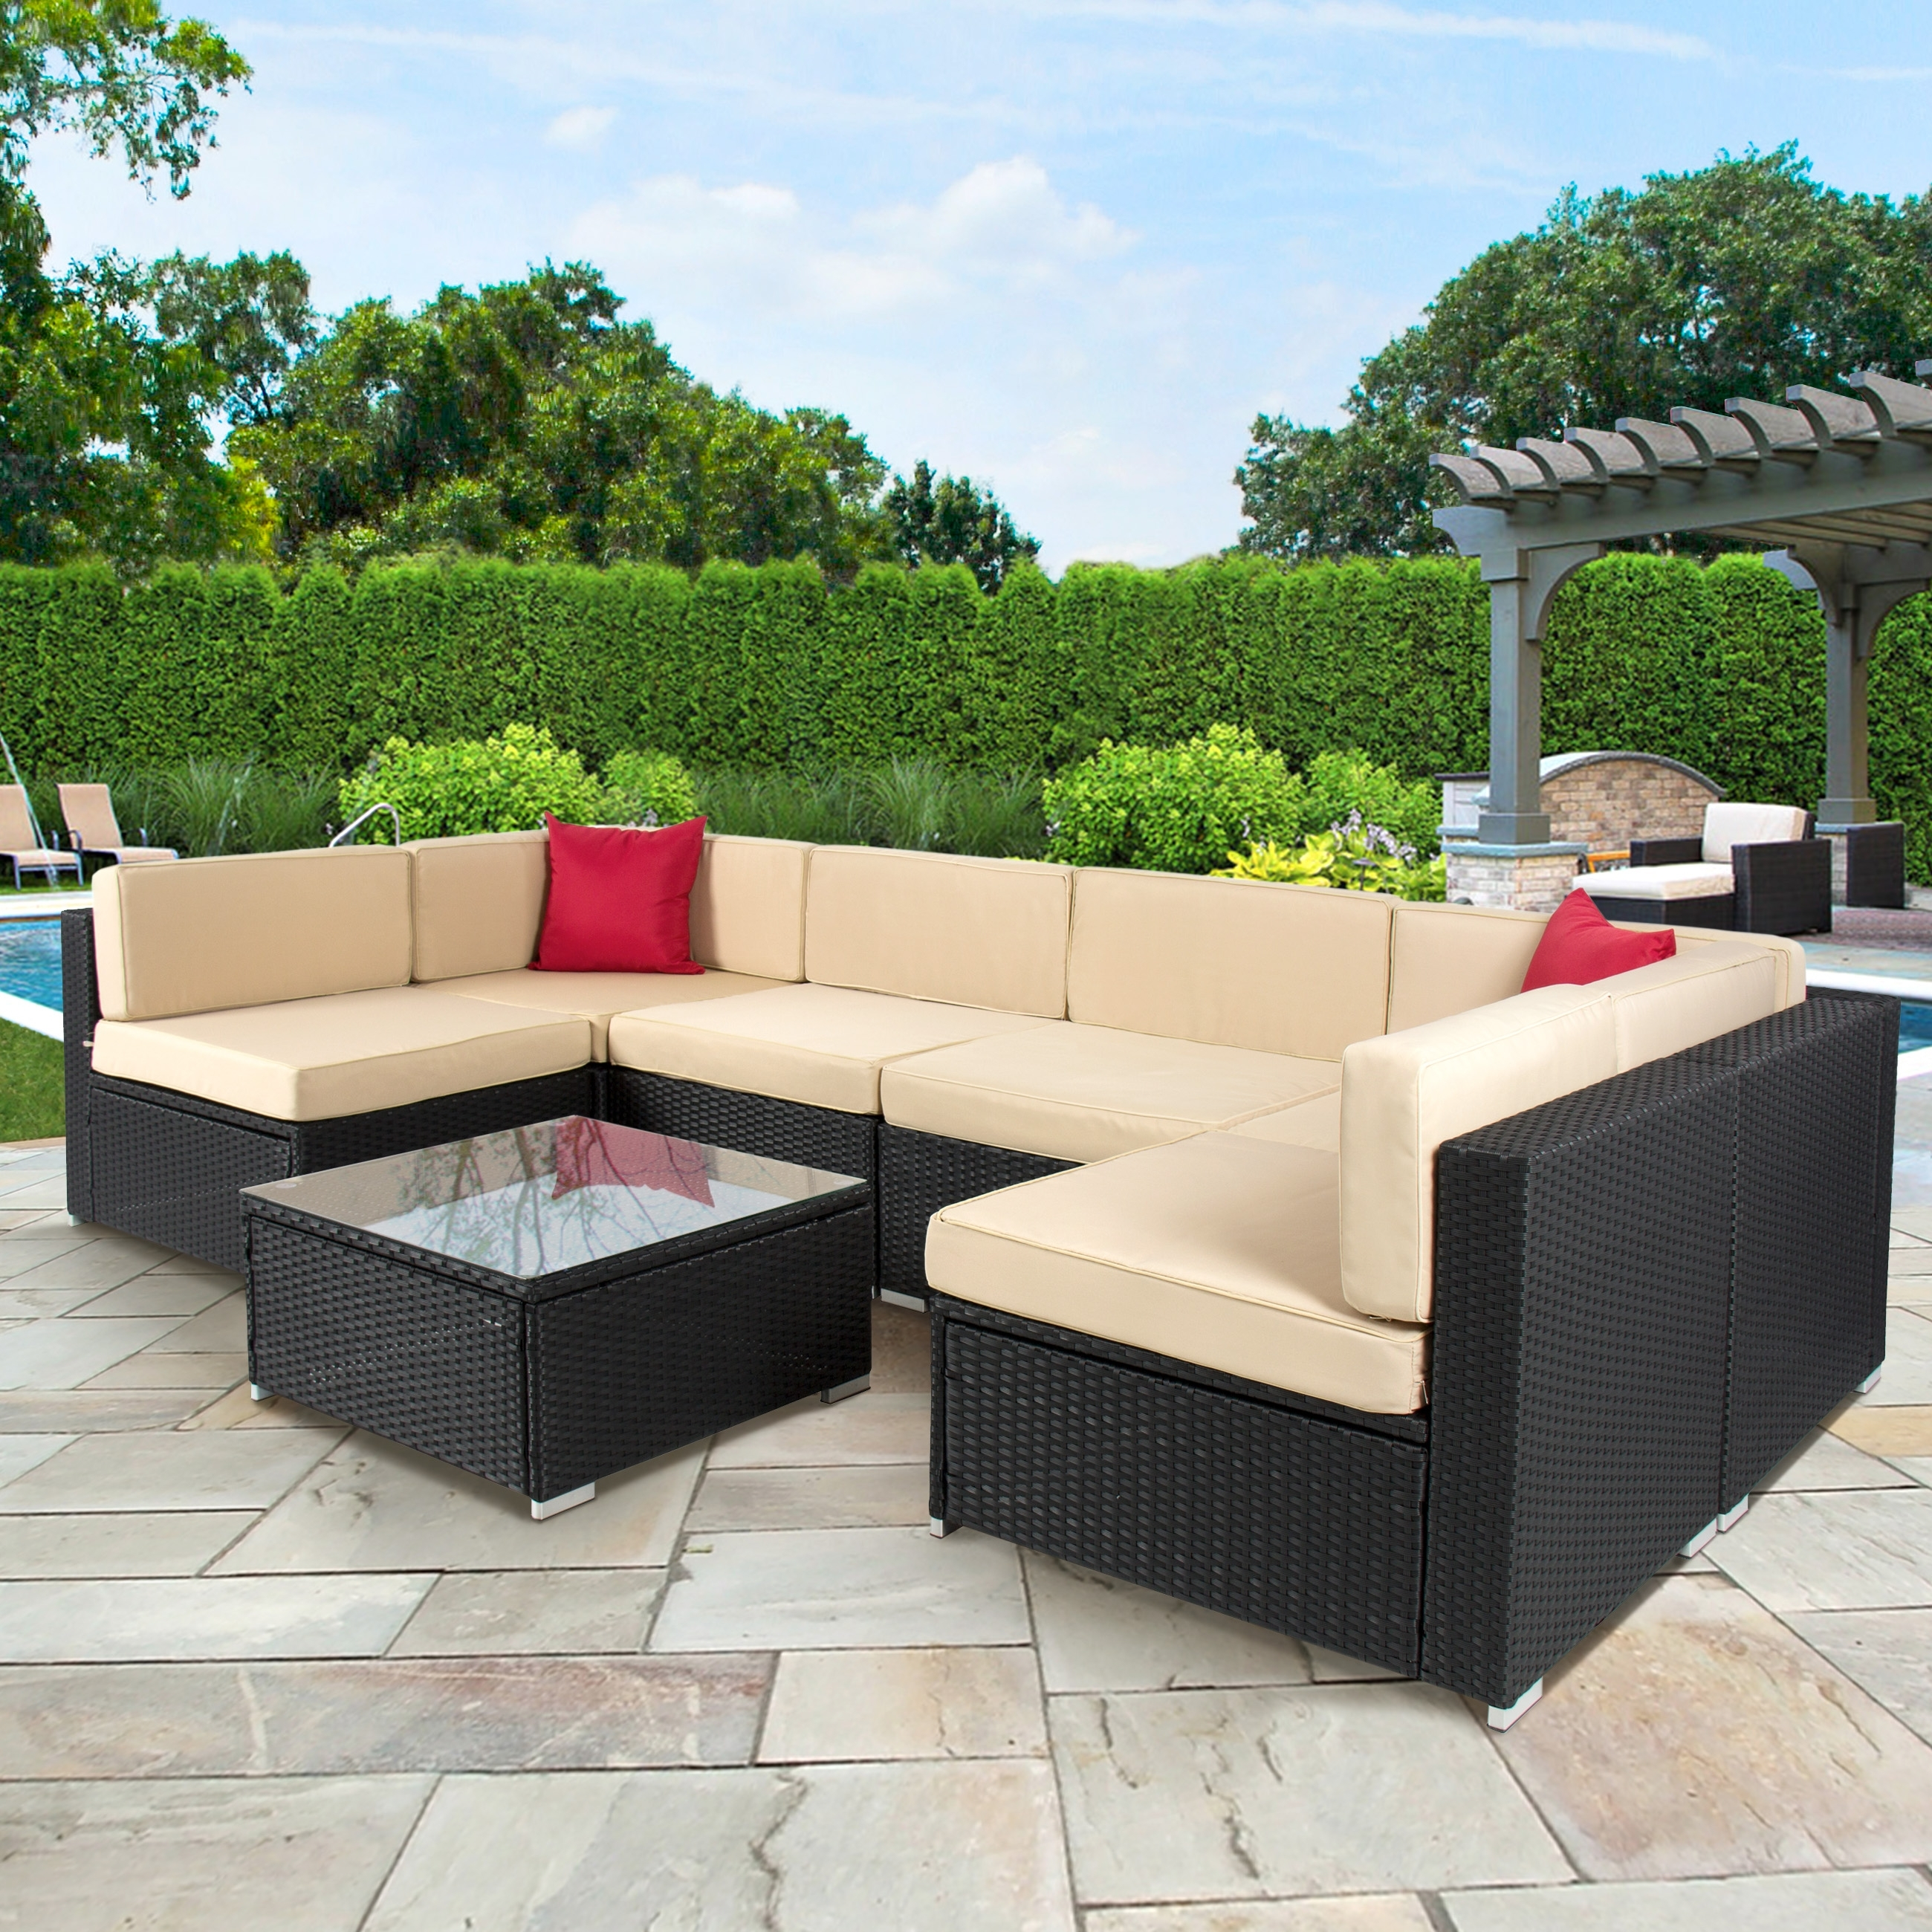 Popular Baner Garden 4 Piece Outdoor Furniture Complete Set, Black – Walmart Regarding Patio Conversation Sets At Walmart (View 14 of 15)